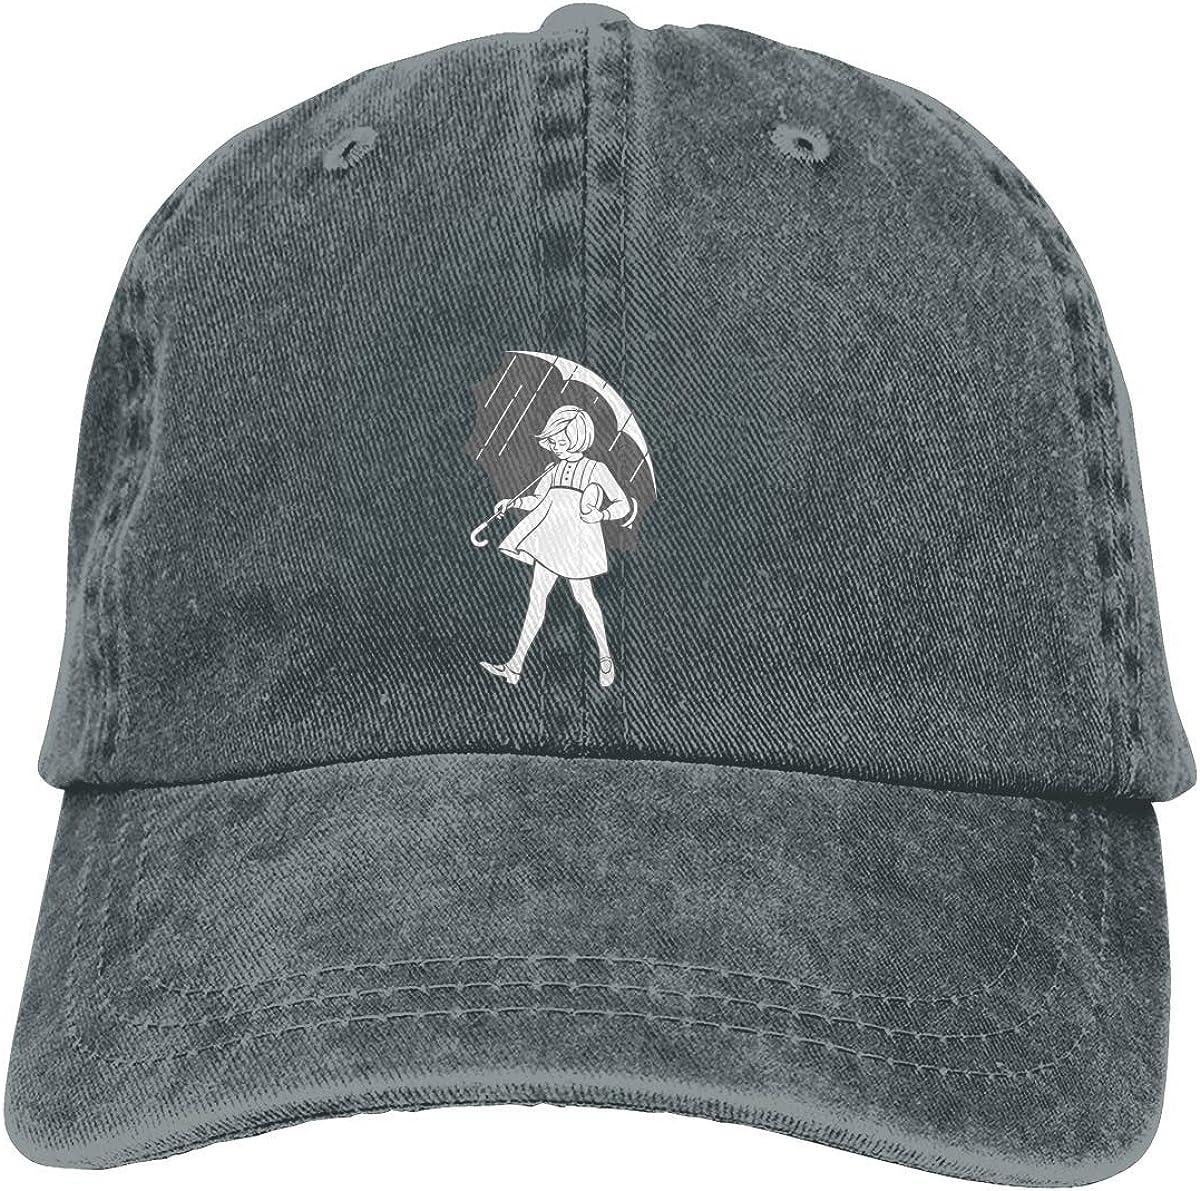 RFTGB Gorras Unisex Accesorios Sombreros Gorras de béisbol Sombreros de Vaquero Don't Be A Salty Bitch Denim Baseball Cap, Unisex Vintage Dad Hat, Golf Hats, Adjustable Plain Cap